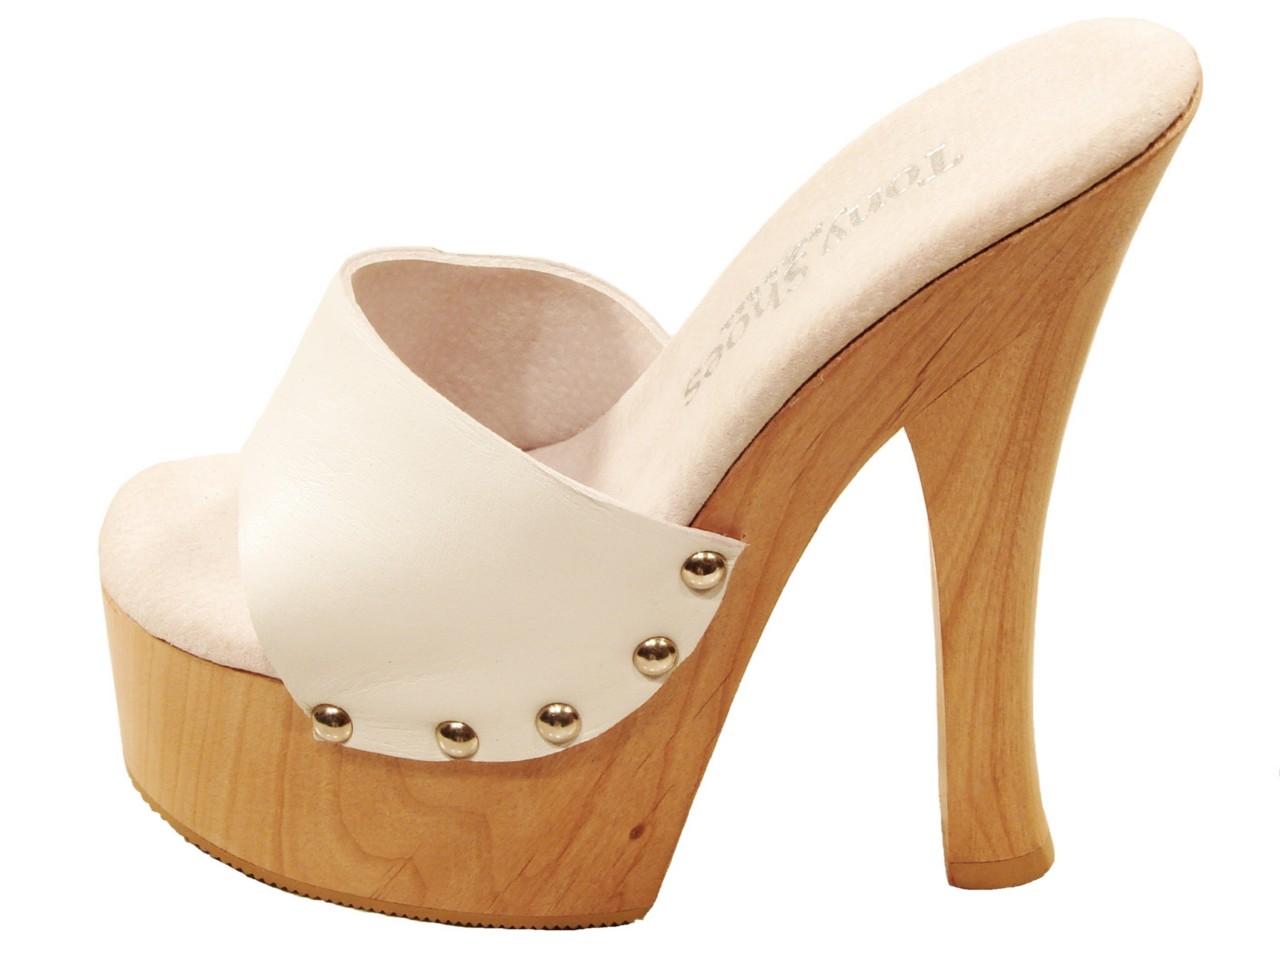 Tony Shoes Candy White High Heel Wood Platform Slip On